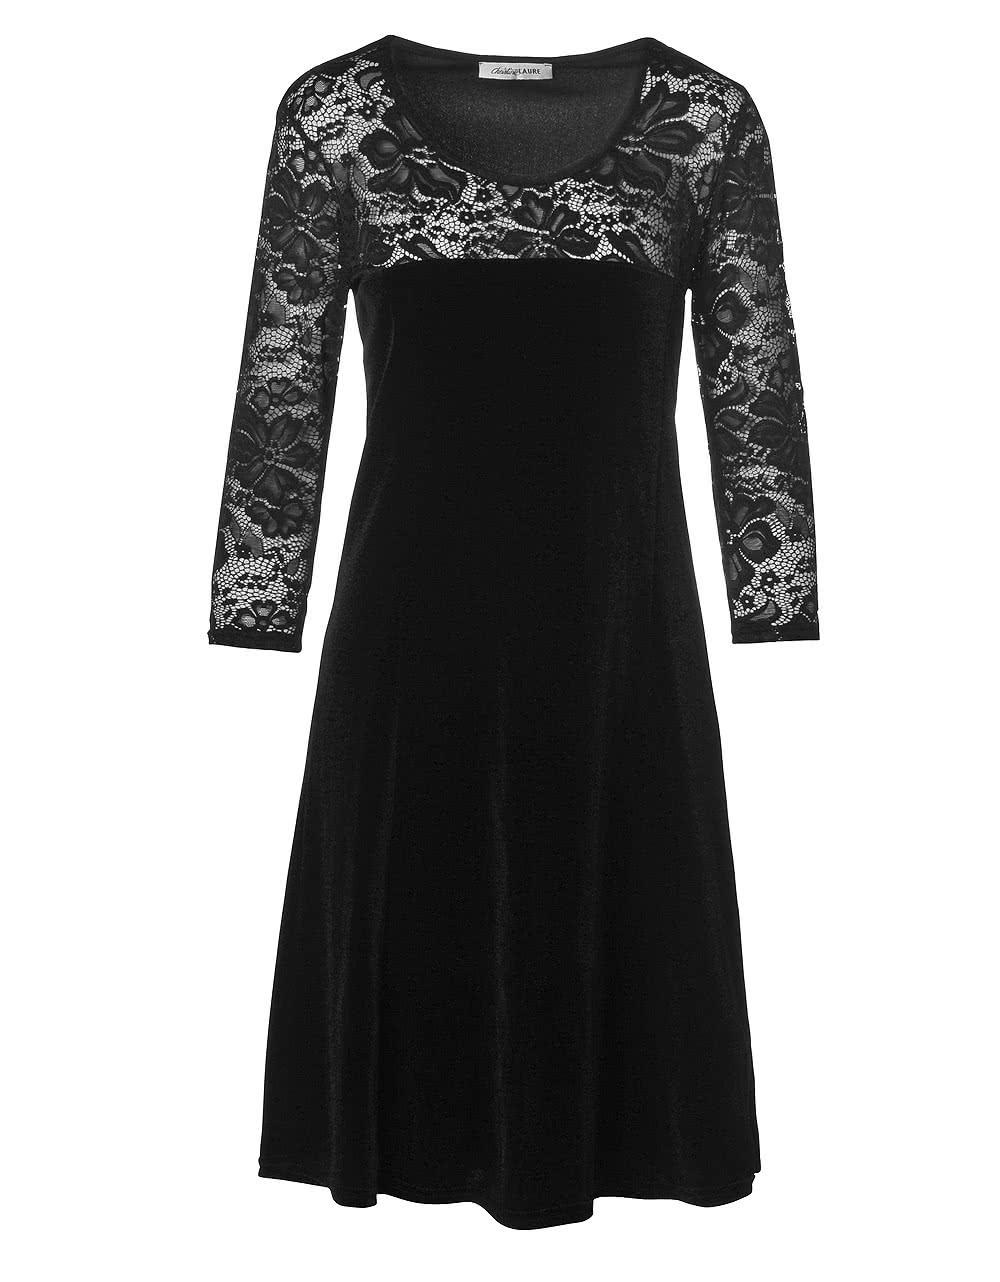 robe-noire-christine-laure